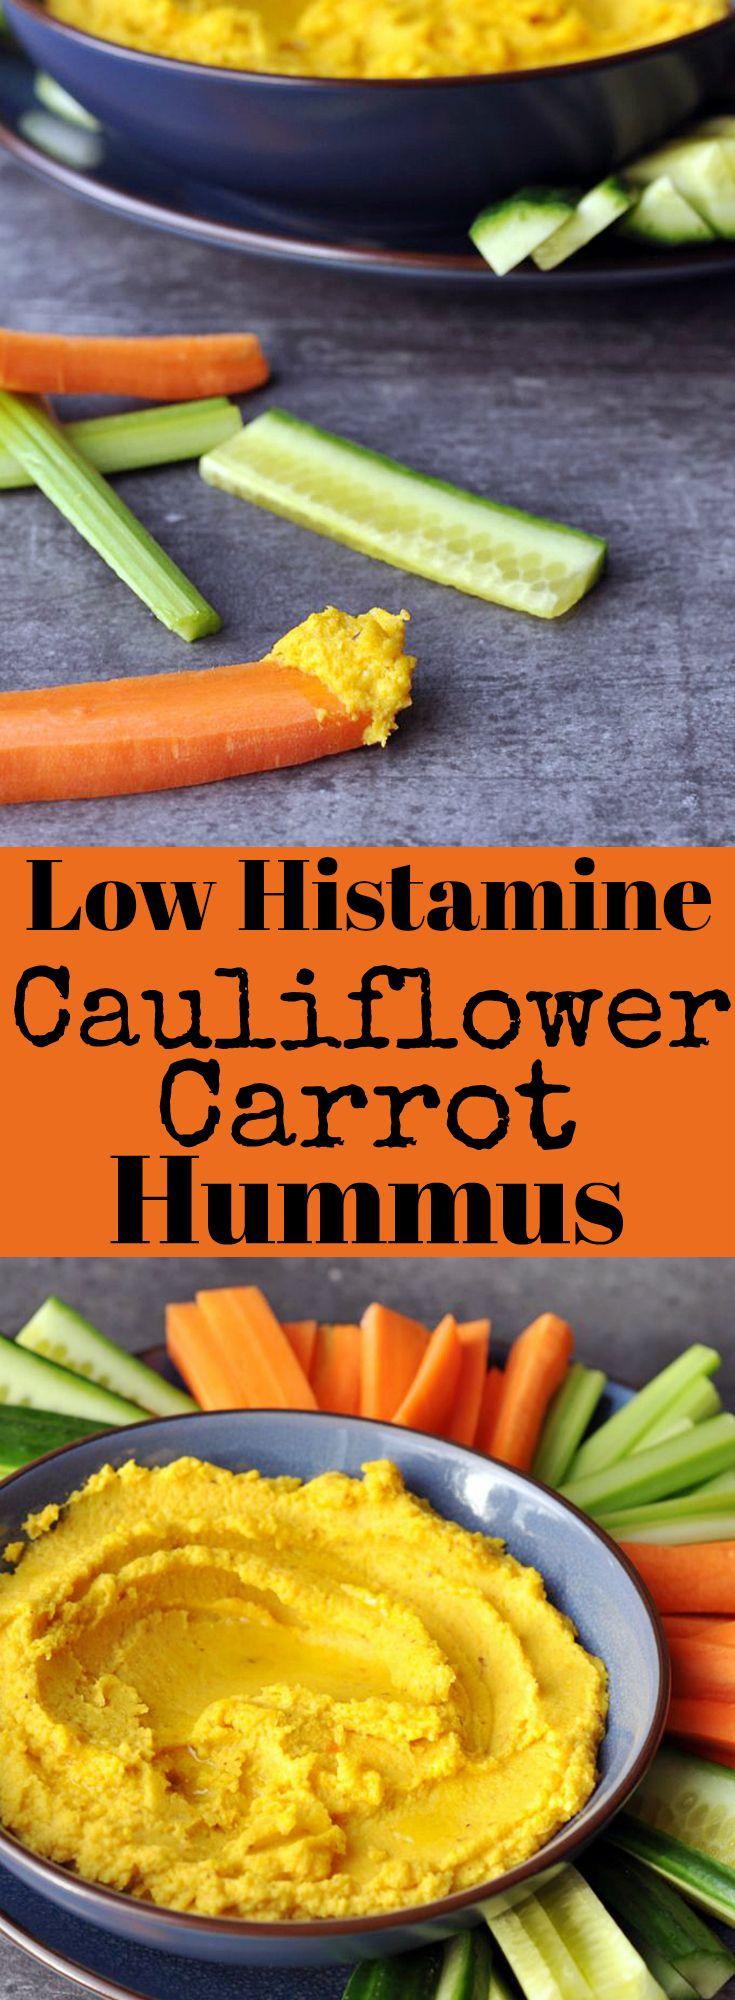 Low Histamine Cauliflower Carrot Hummus - Bean Free!